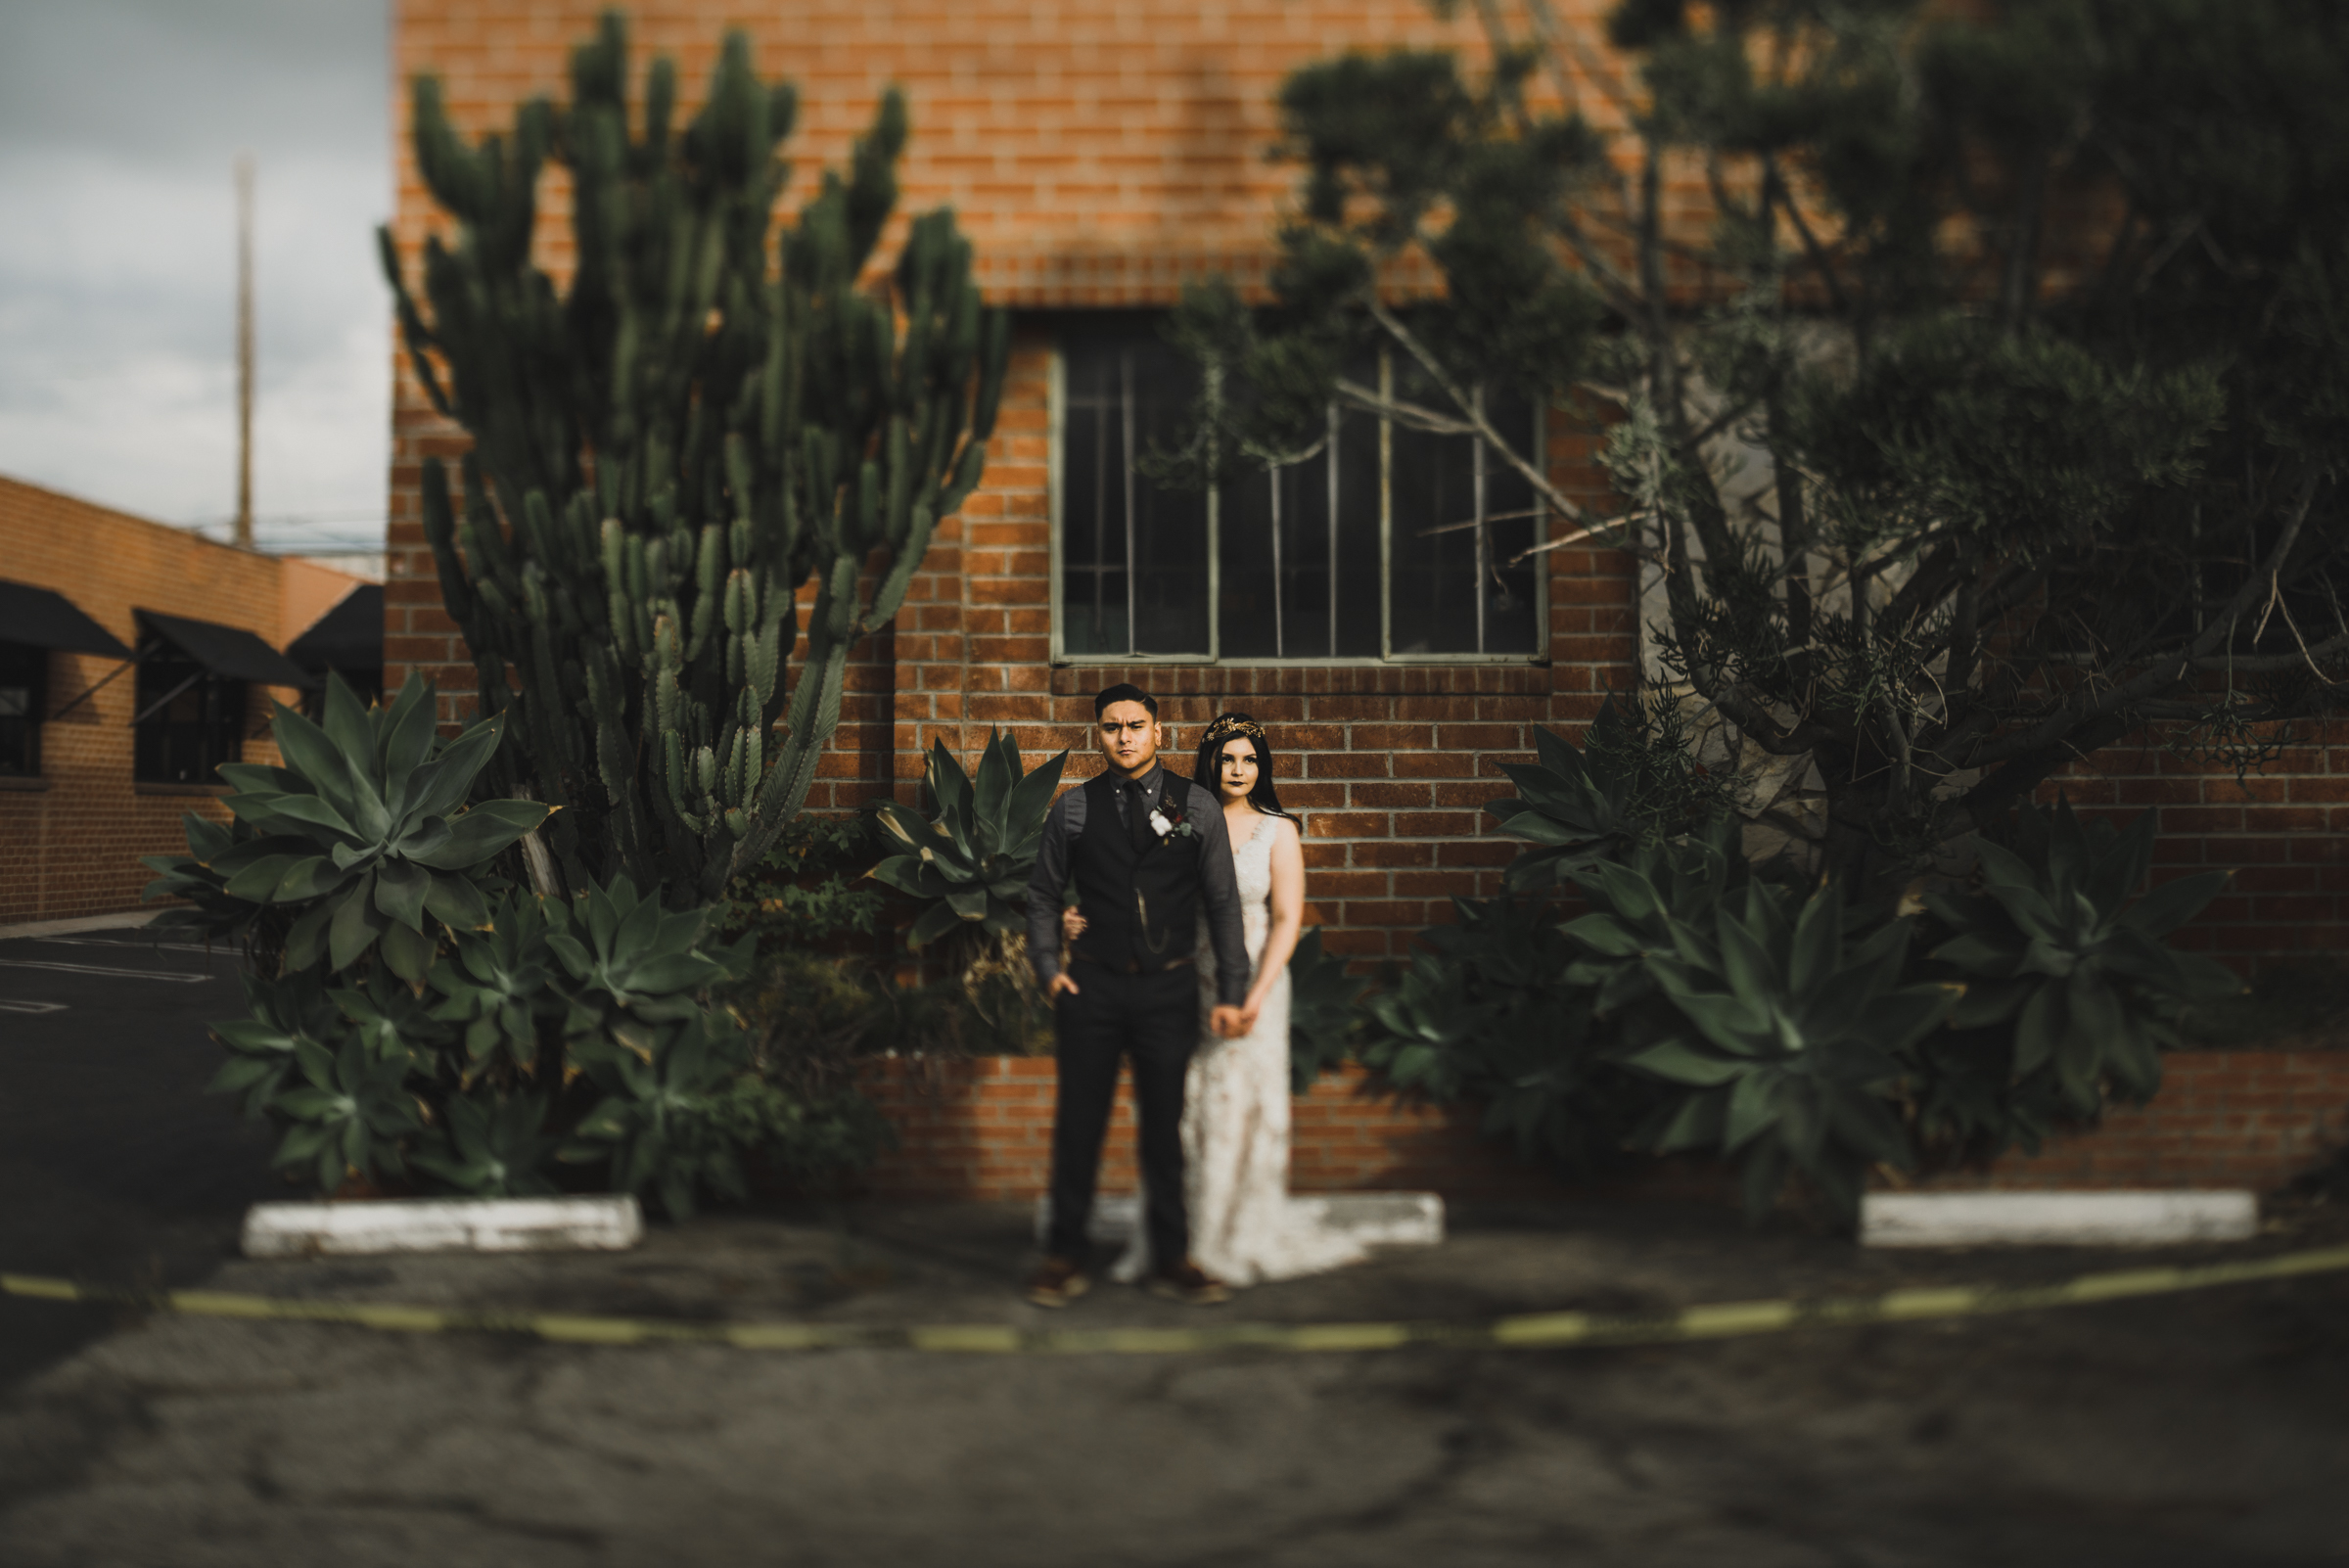 ©Isaiah + Taylor Photography - Smoky Hollow Studios Wedding, El Segundo, Los Angeles Wedding Photographer-86.jpg